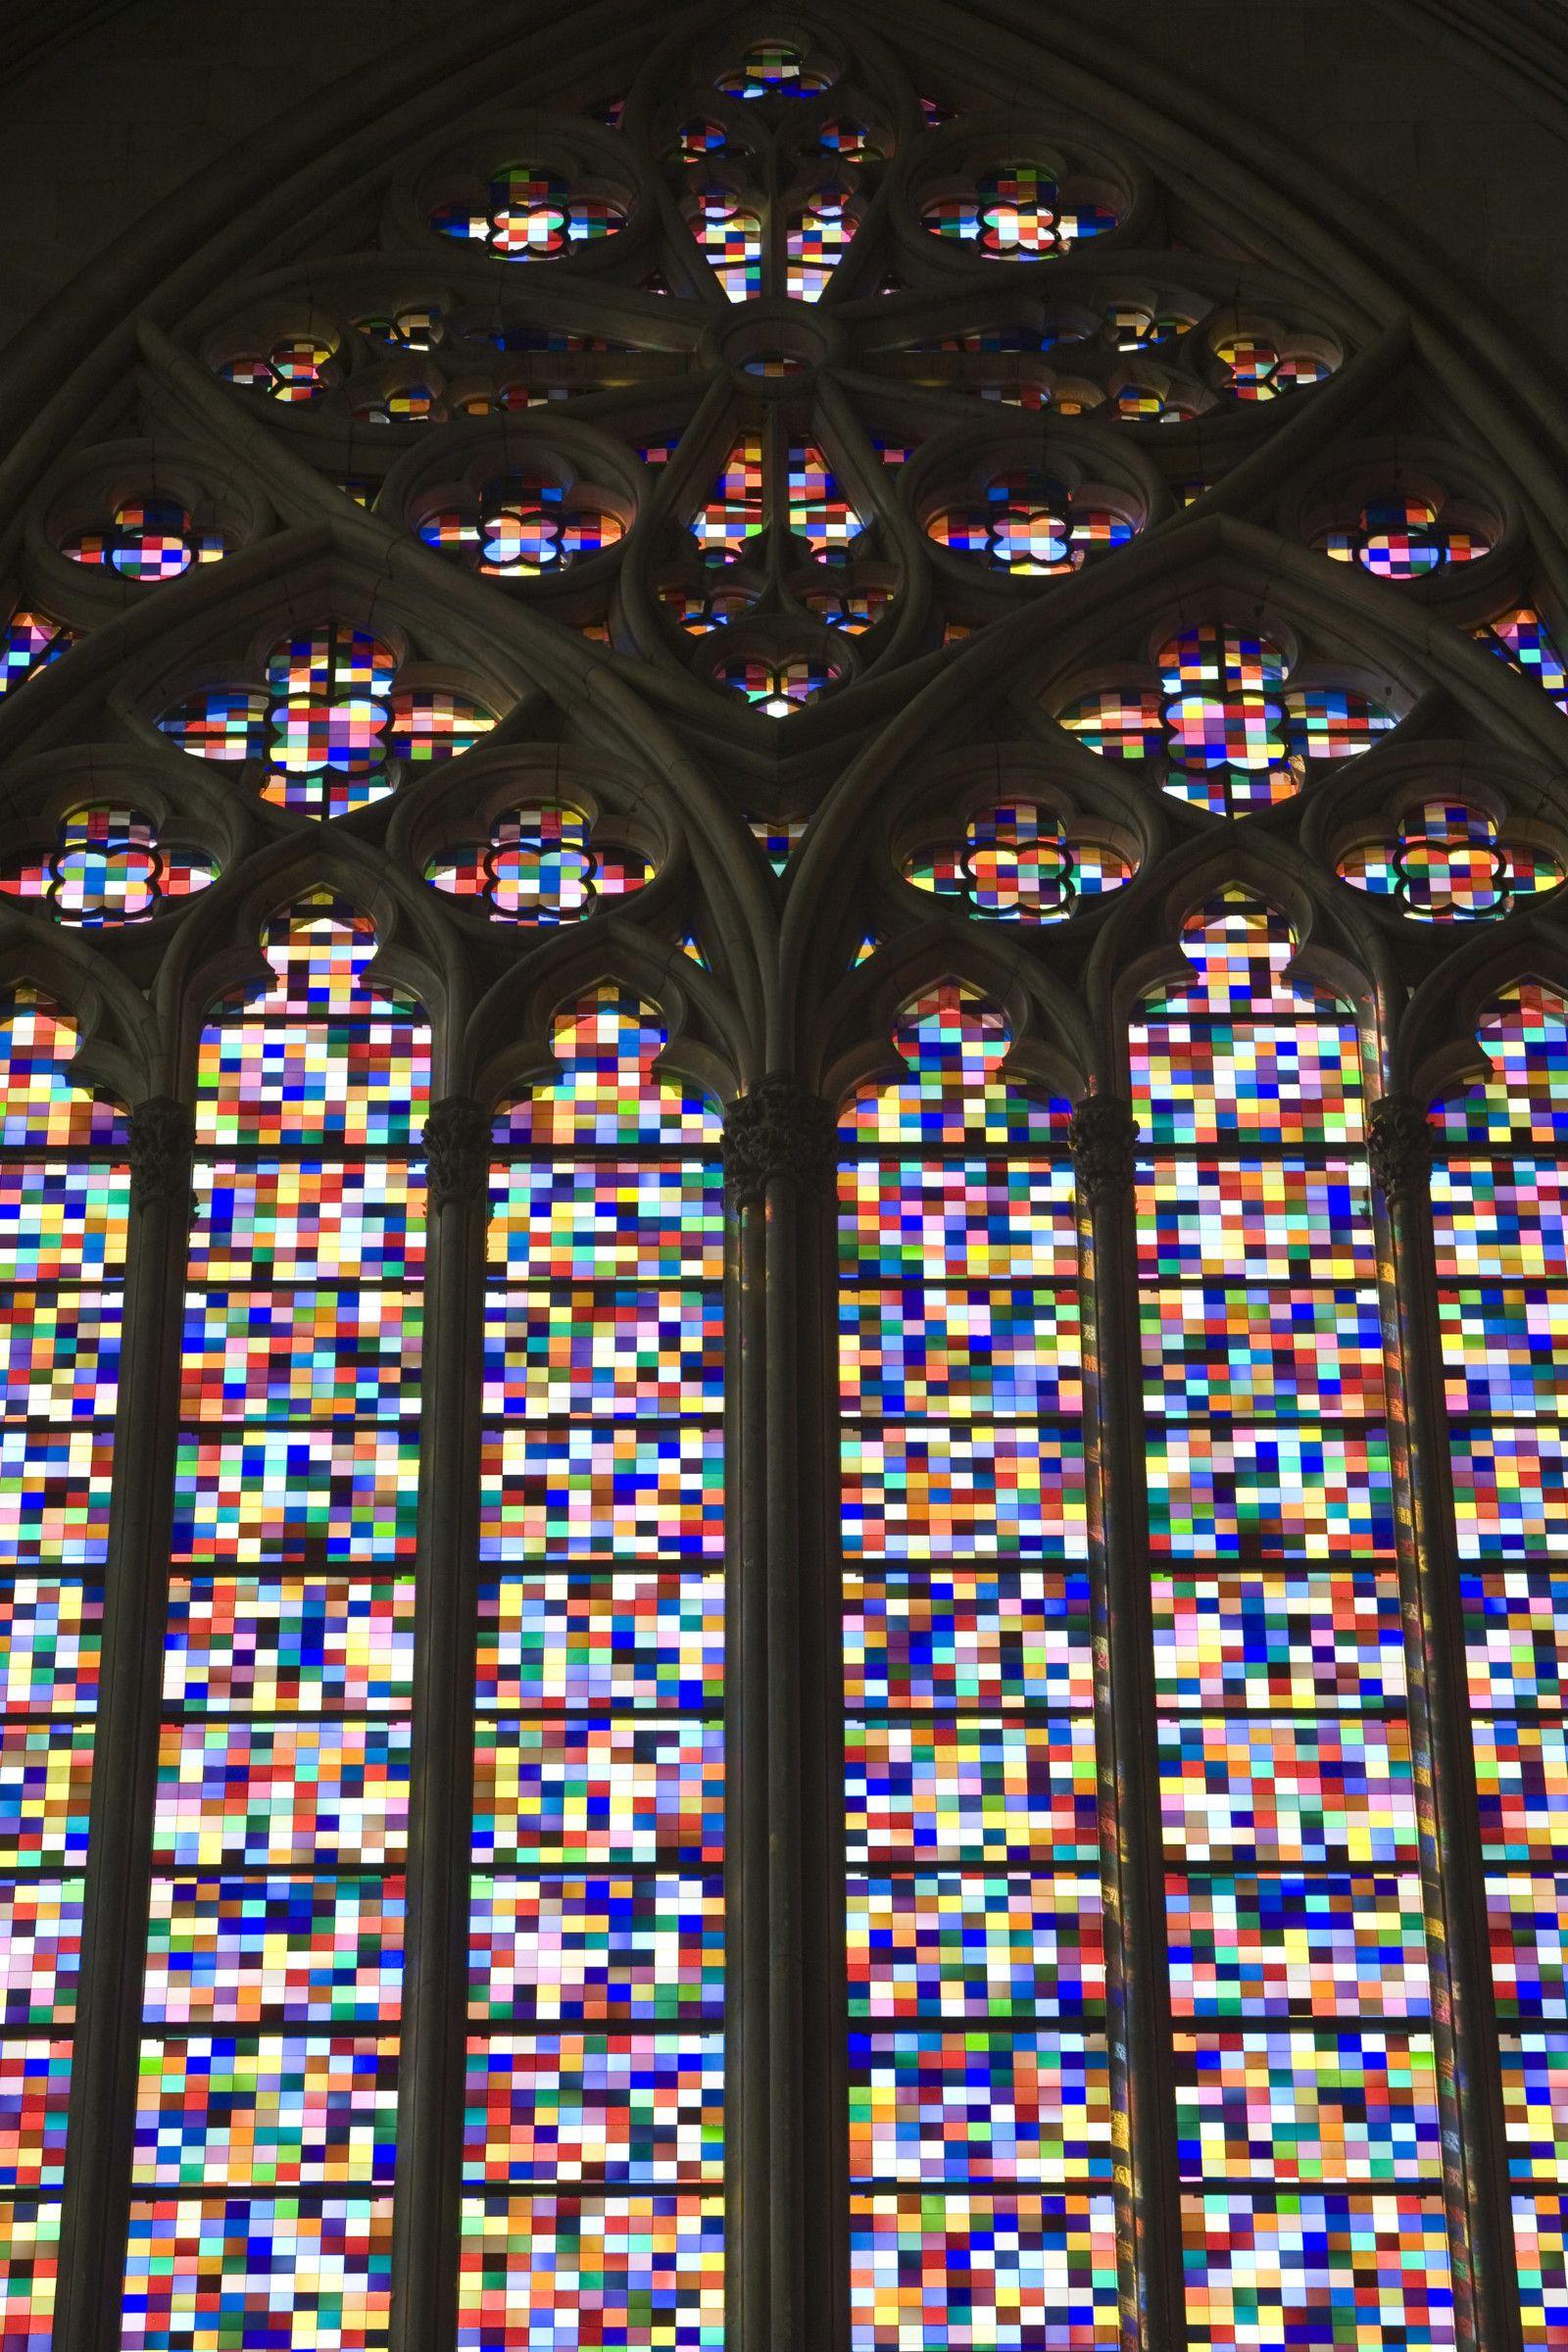 Gerhard Richter Kolner Domfenster Cologne Cathedral Window 2007 11 000 Hand Blown Glass Panels 7 Gerhard Richter Church Windows Gerhard Richter Abstract